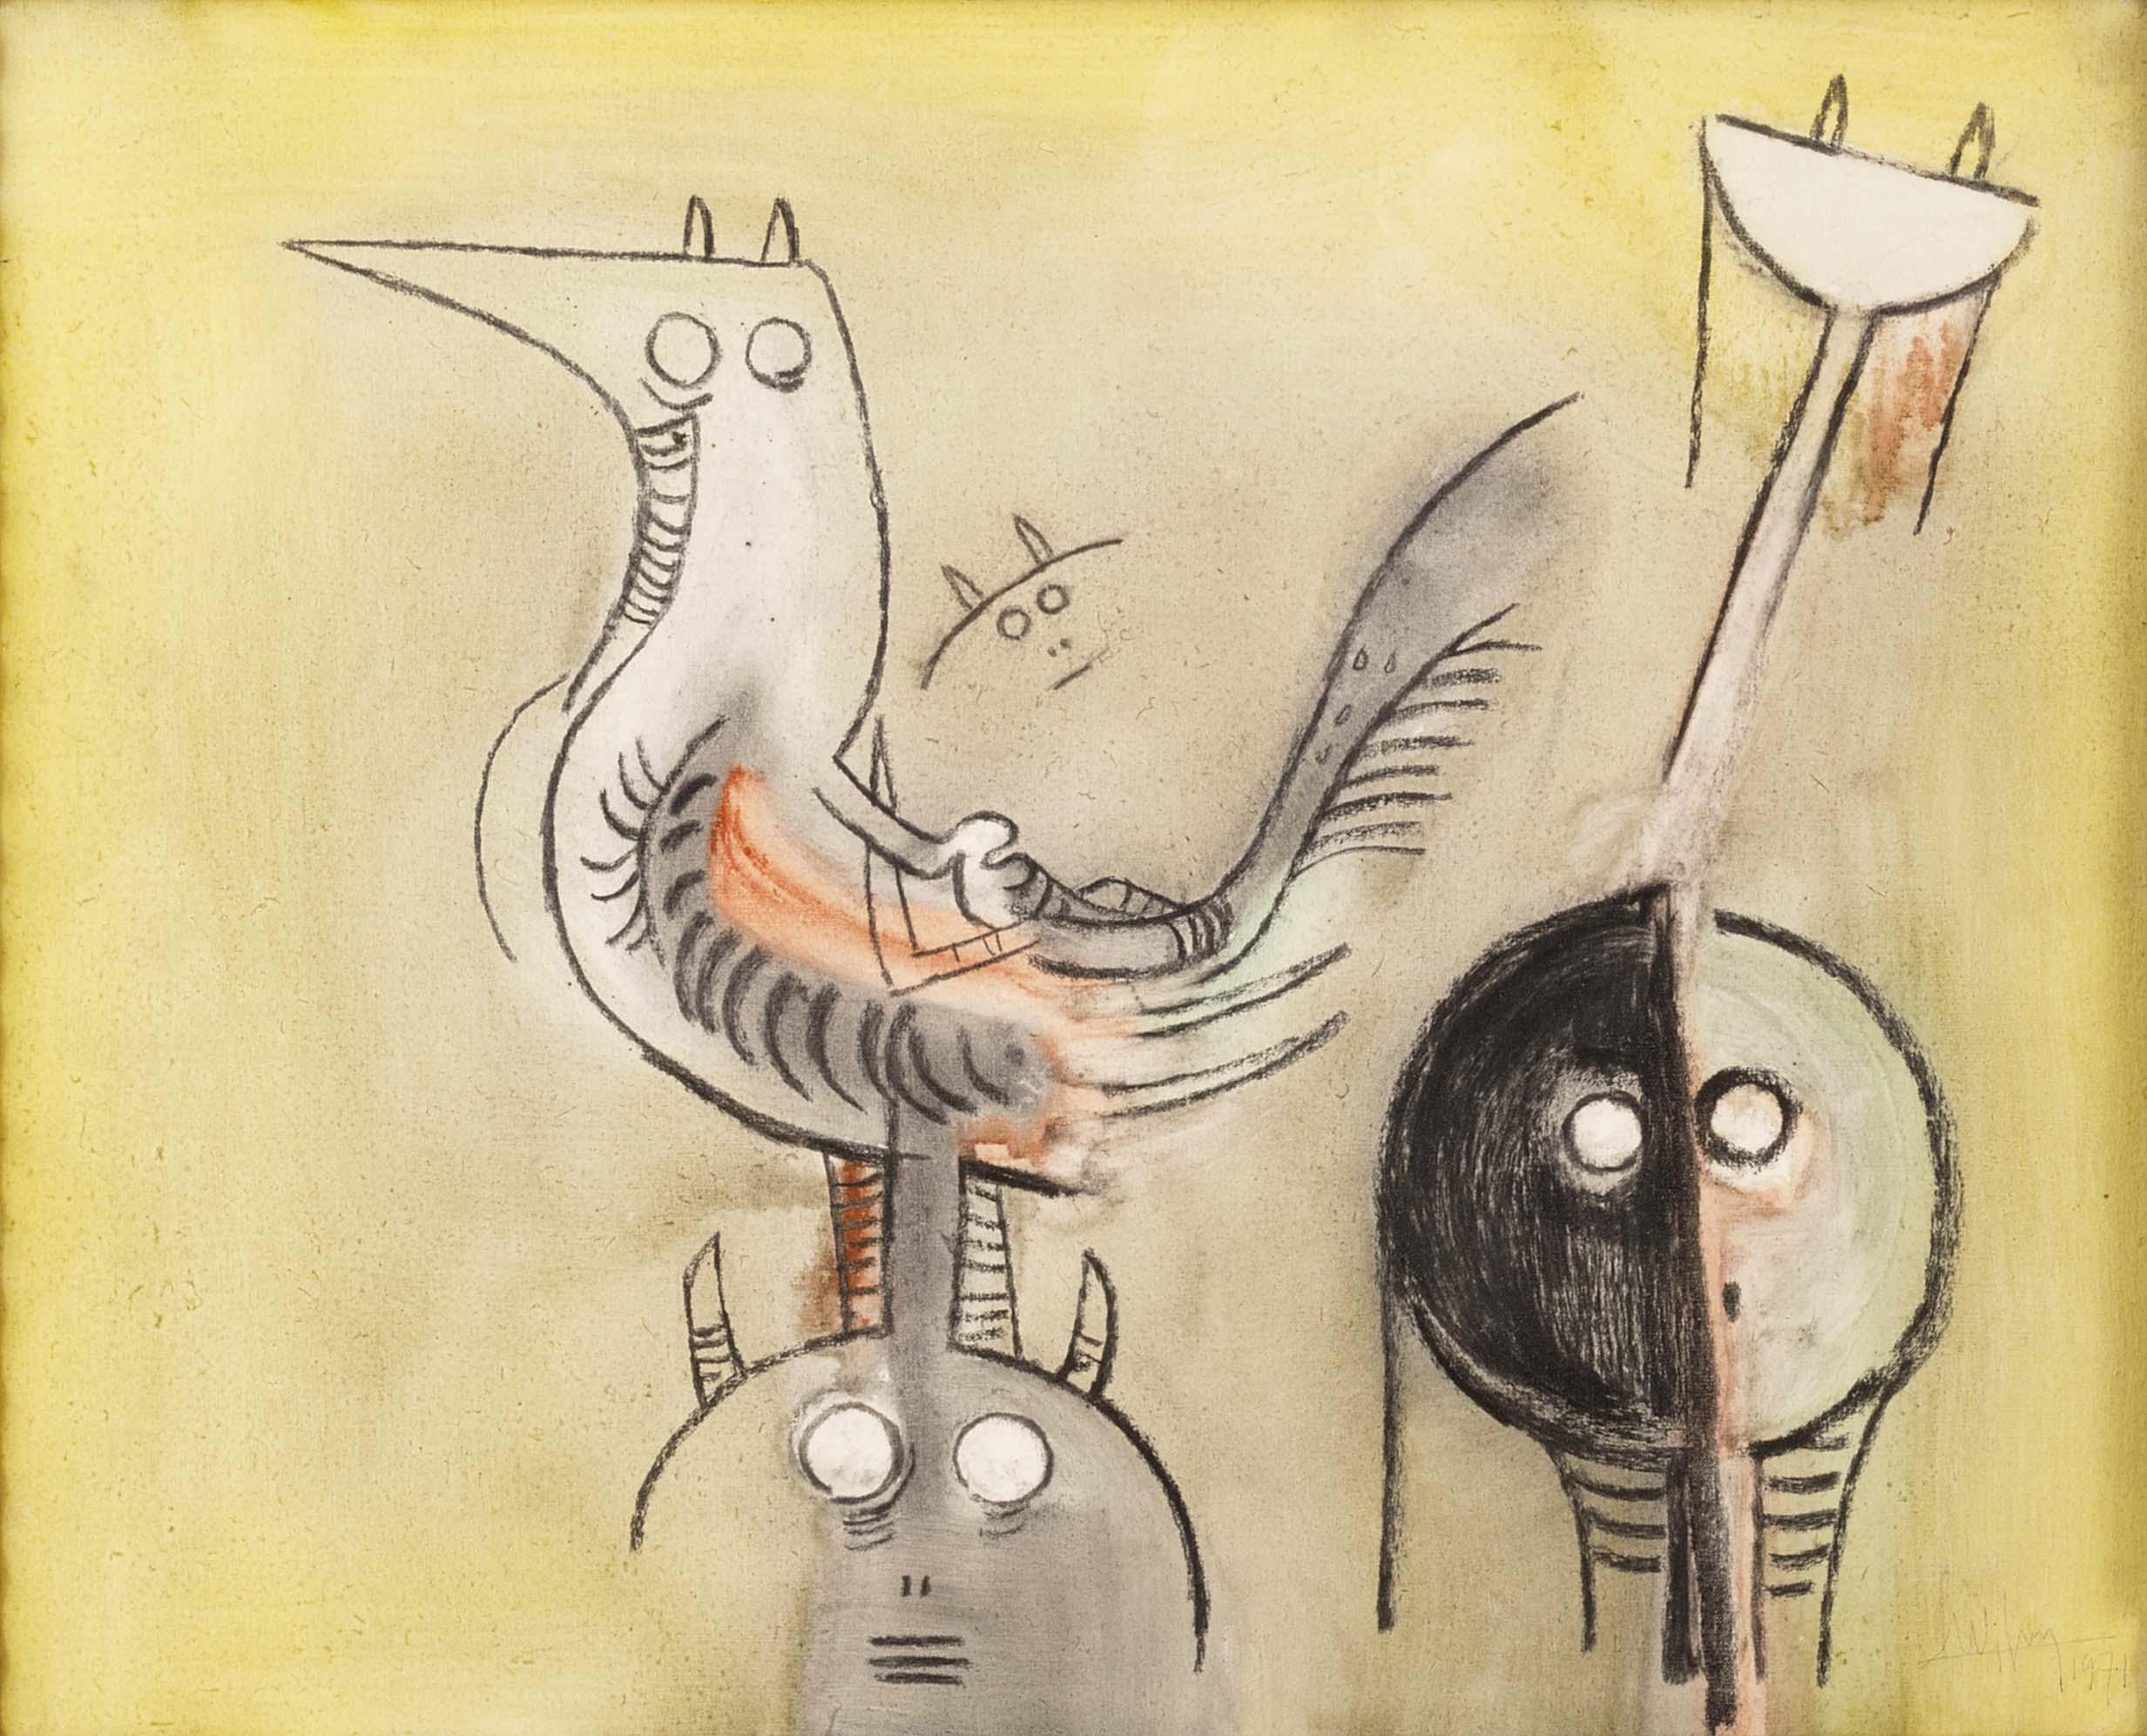 Obra de arte de Wifredo Lam serán subastadas por internet